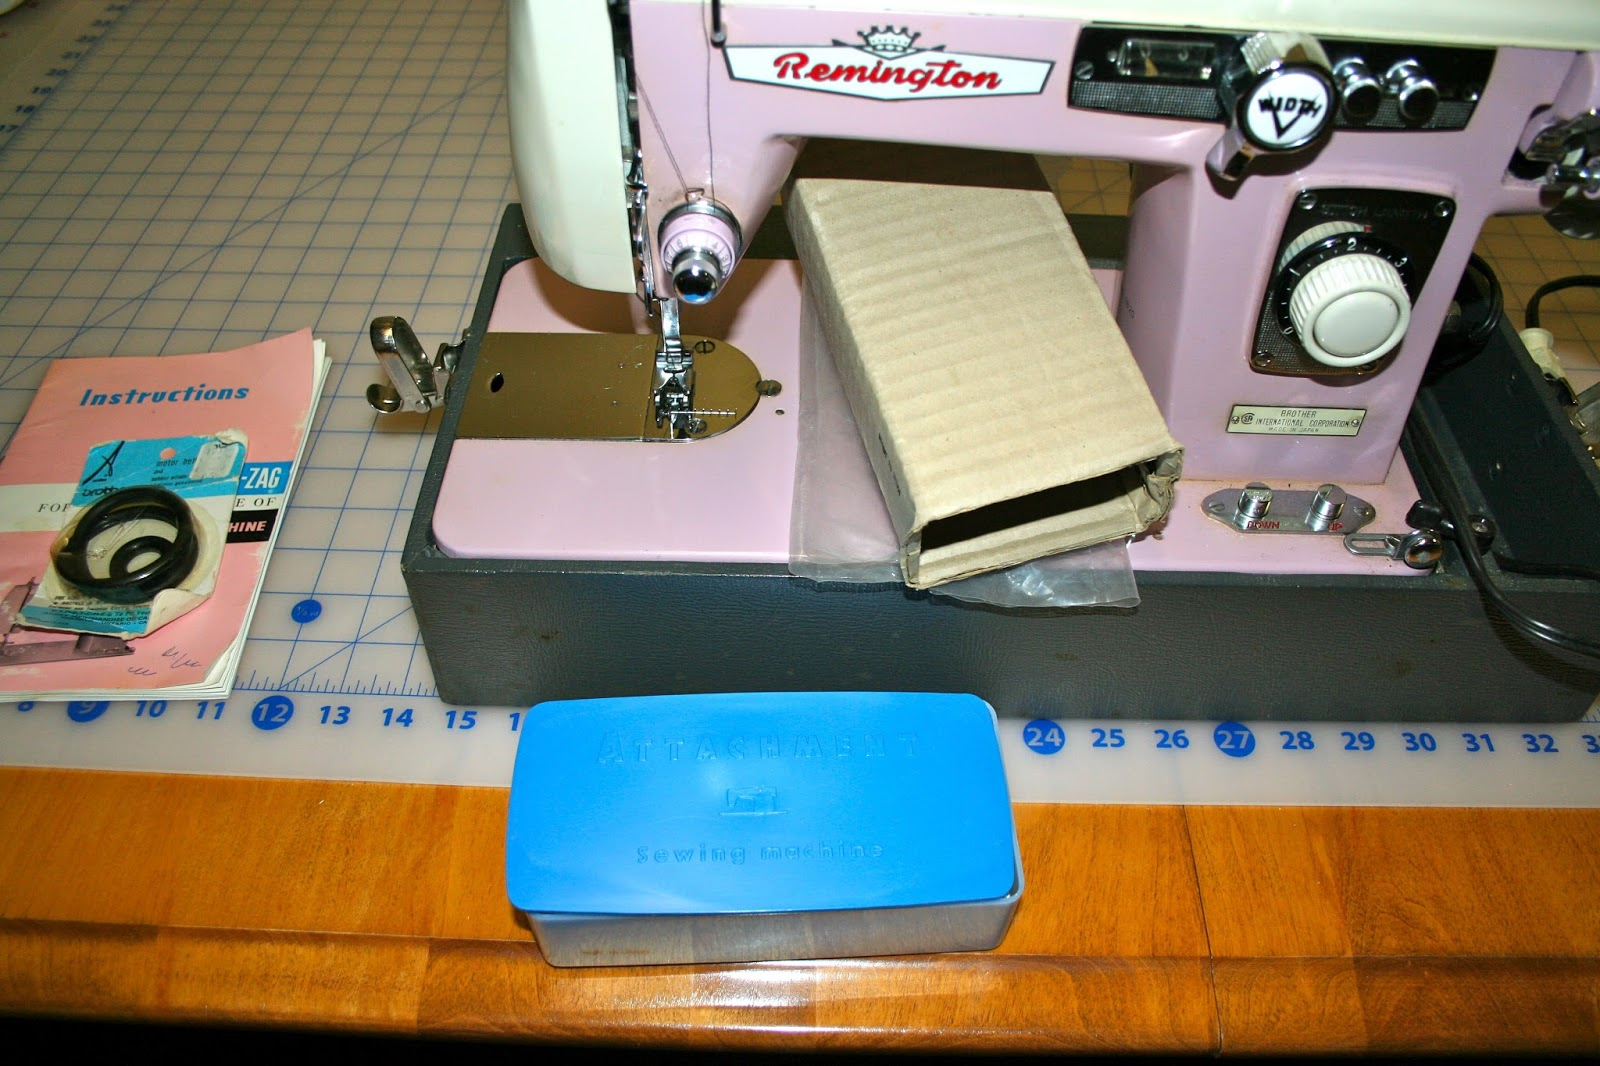 remington sewing machine value